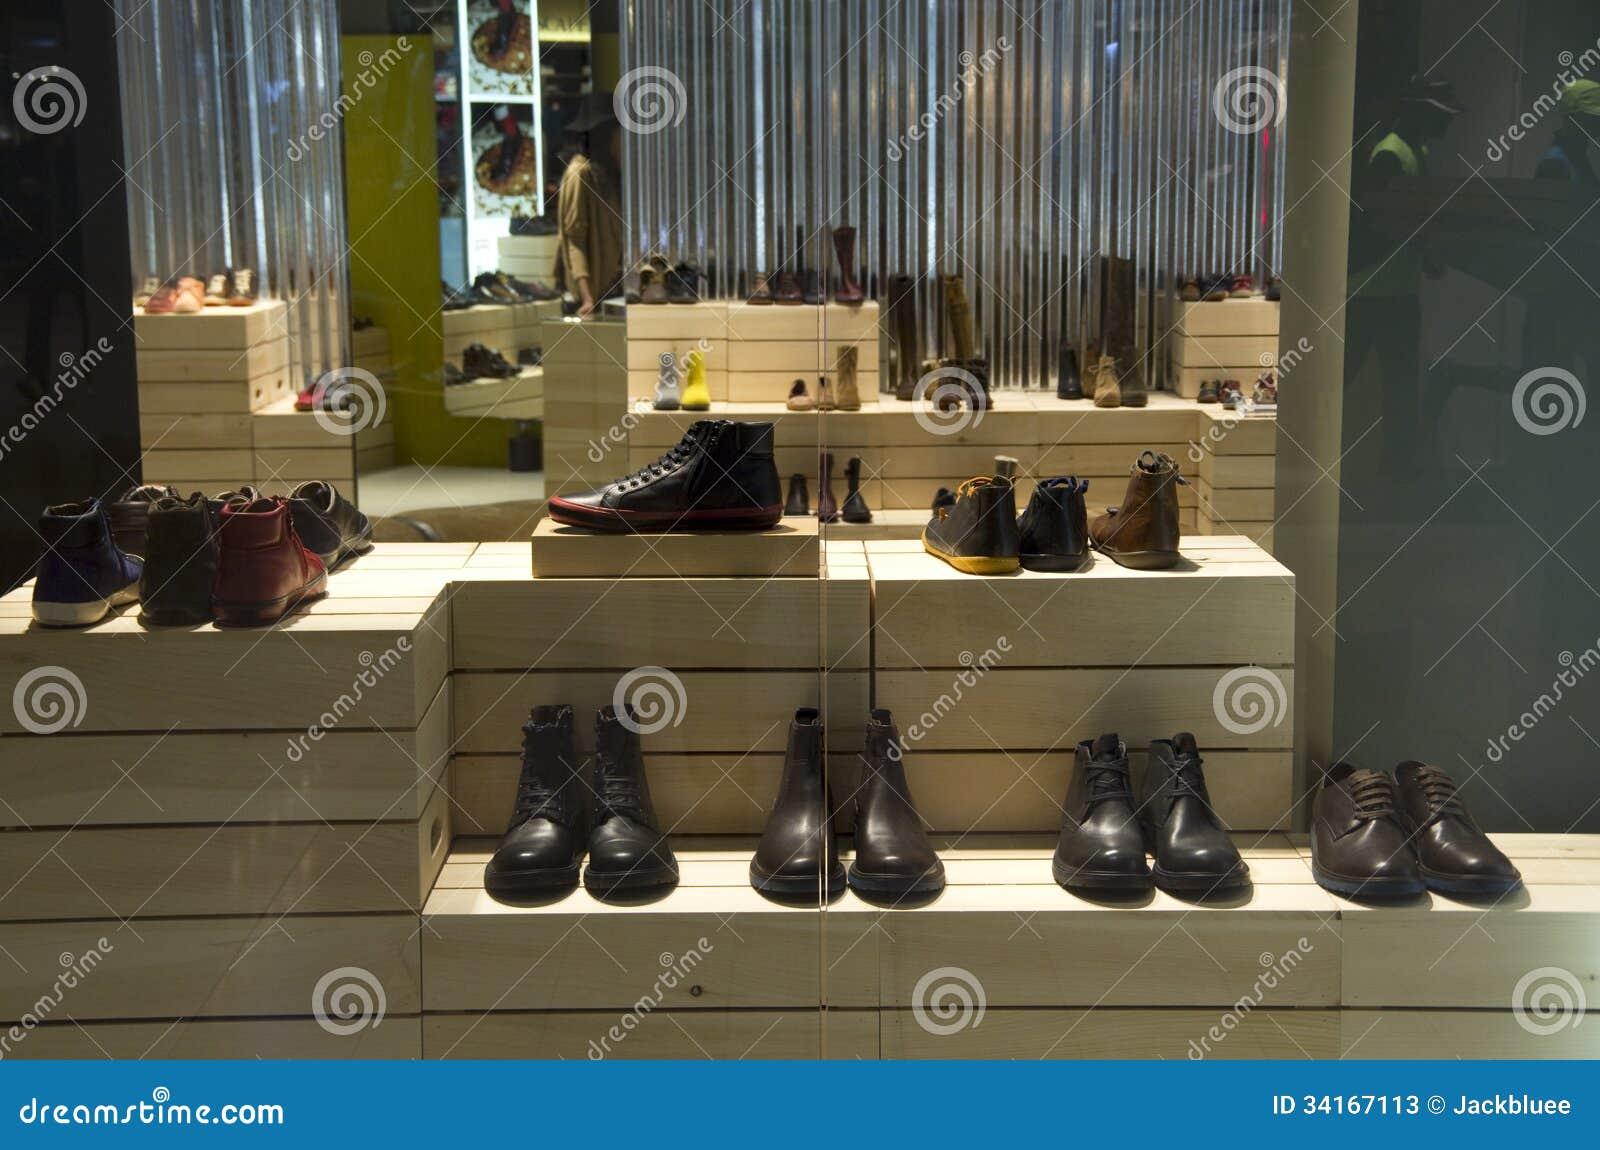 Be Fashion Boutique Australia - HD Photos Gallery